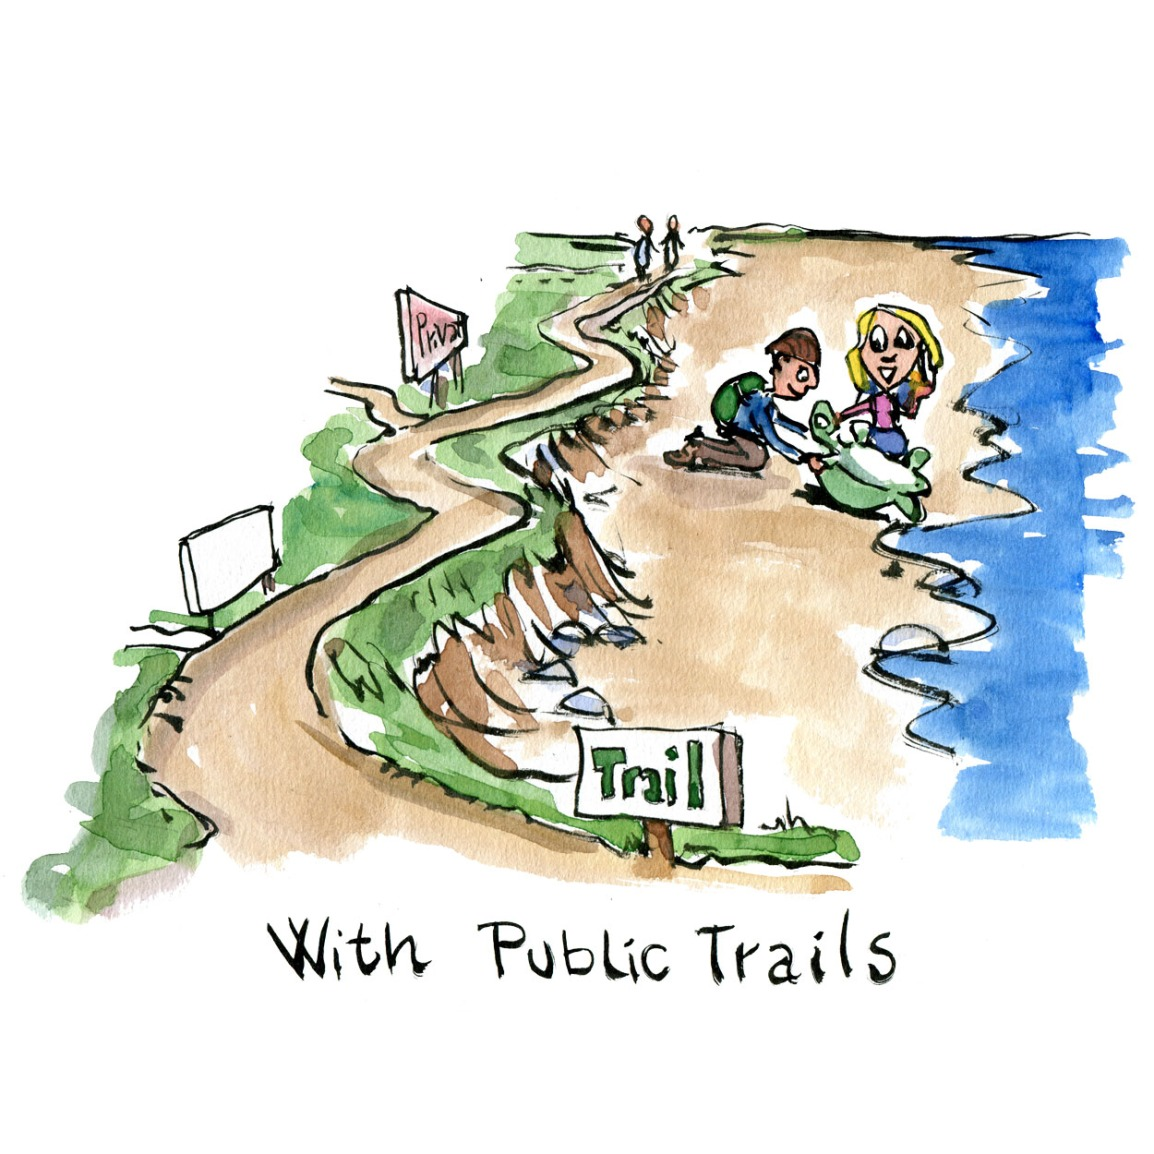 illustration-sea-turtle-coastal-trail-or-private-beach-2-by-frits-ahlefeldt